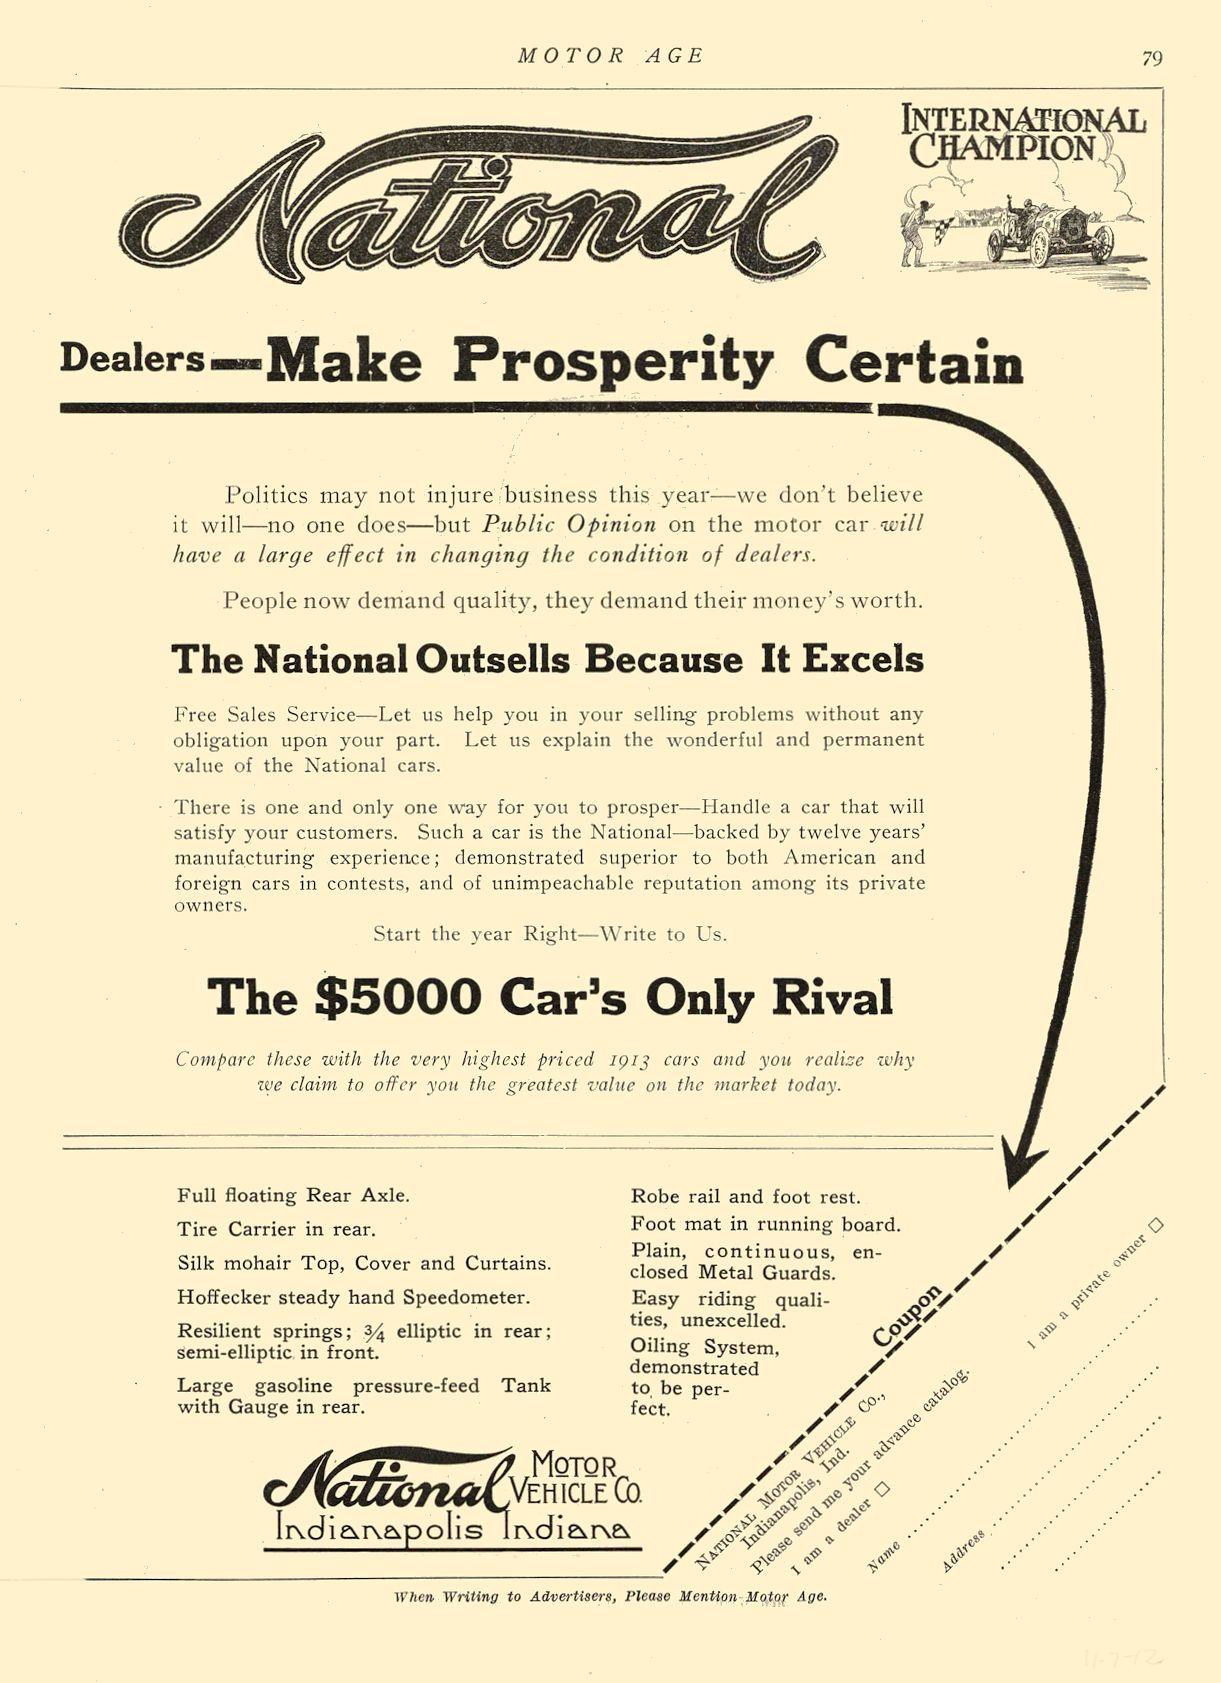 1912 11 7 NATIONAL National INTERNATIONAL CHAMPION Dealers—Make Prosperity Certain National MOTOR VEHICLE CO. Indianapolis, IND MOTOR AGE November 7, 1912 8.25″x12″ page 79